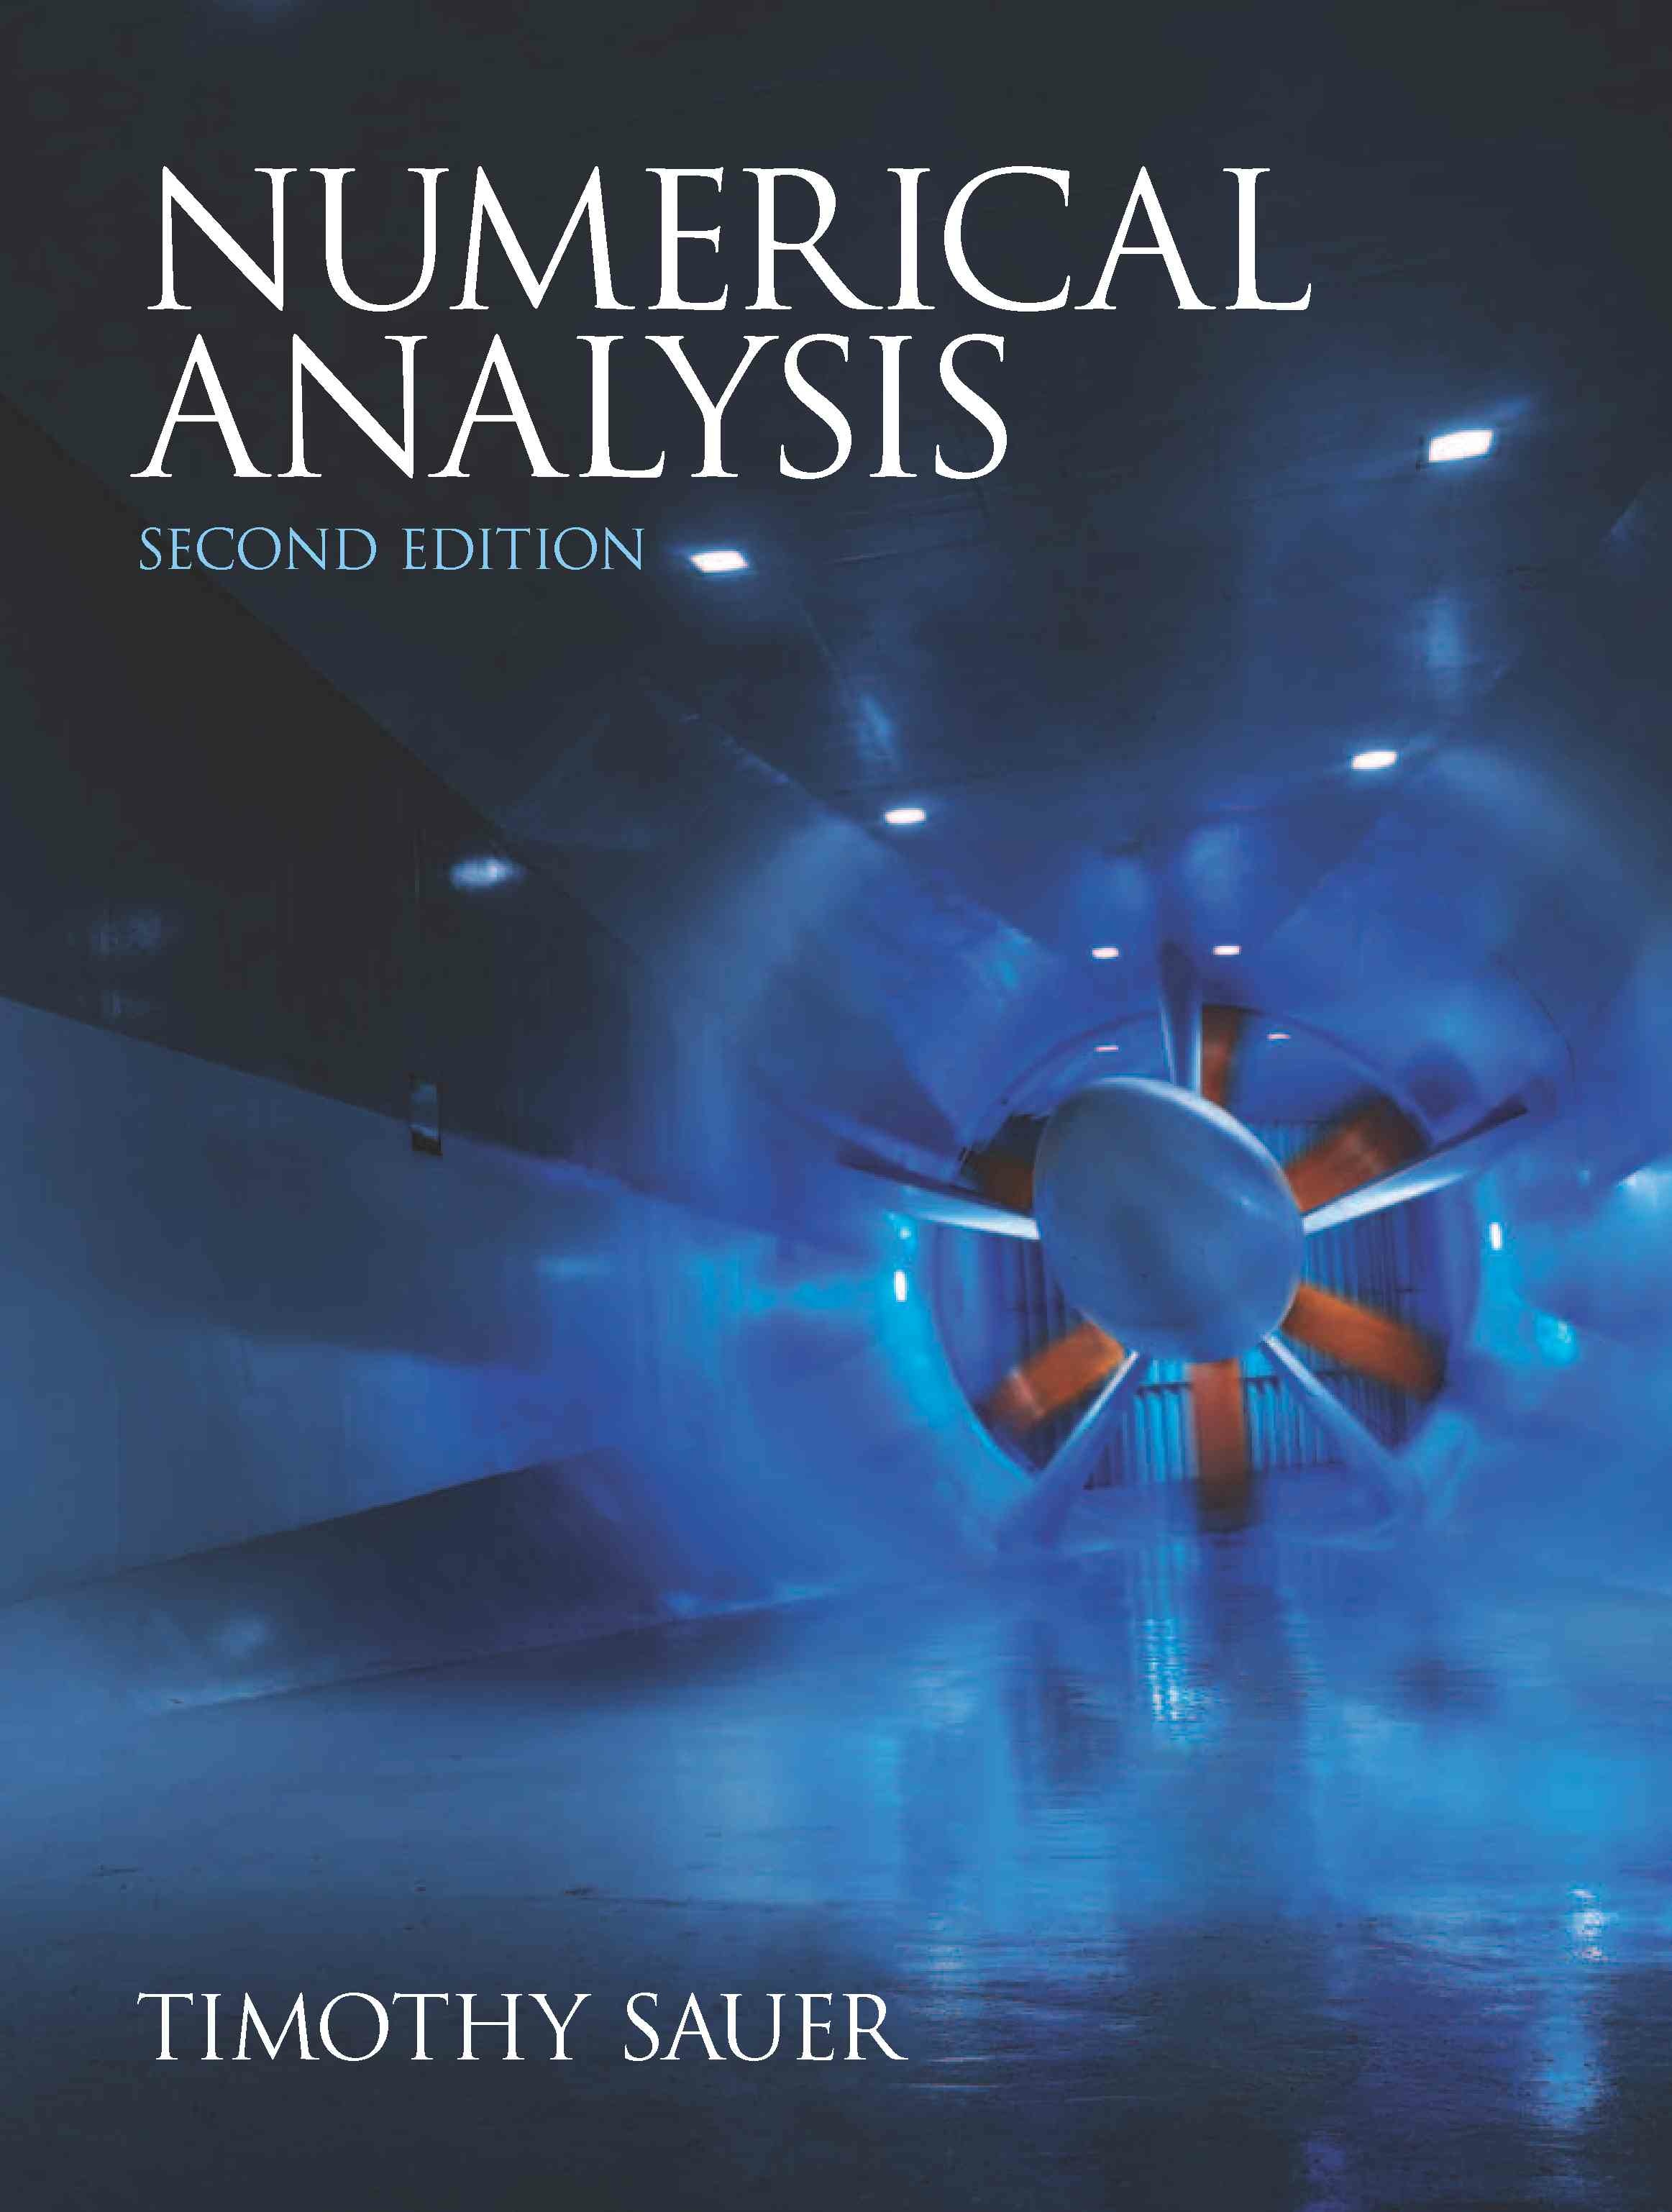 Pdf free] numerical analysis download tygu65gtyt.